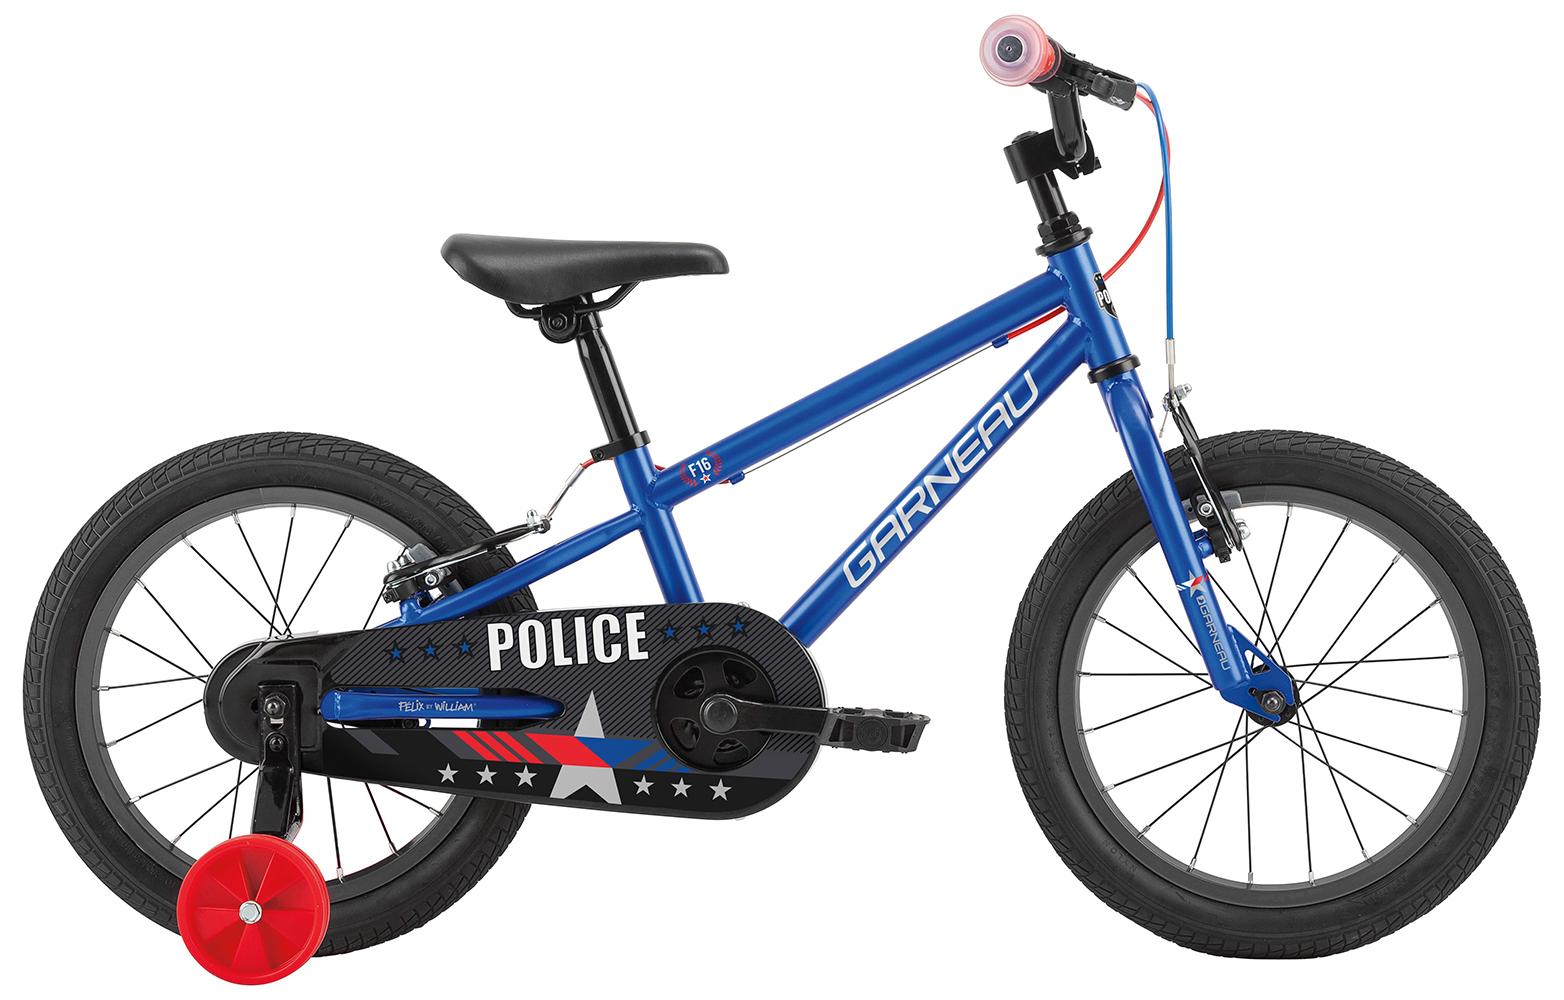 Vélo Louis Garneau F16 - Police